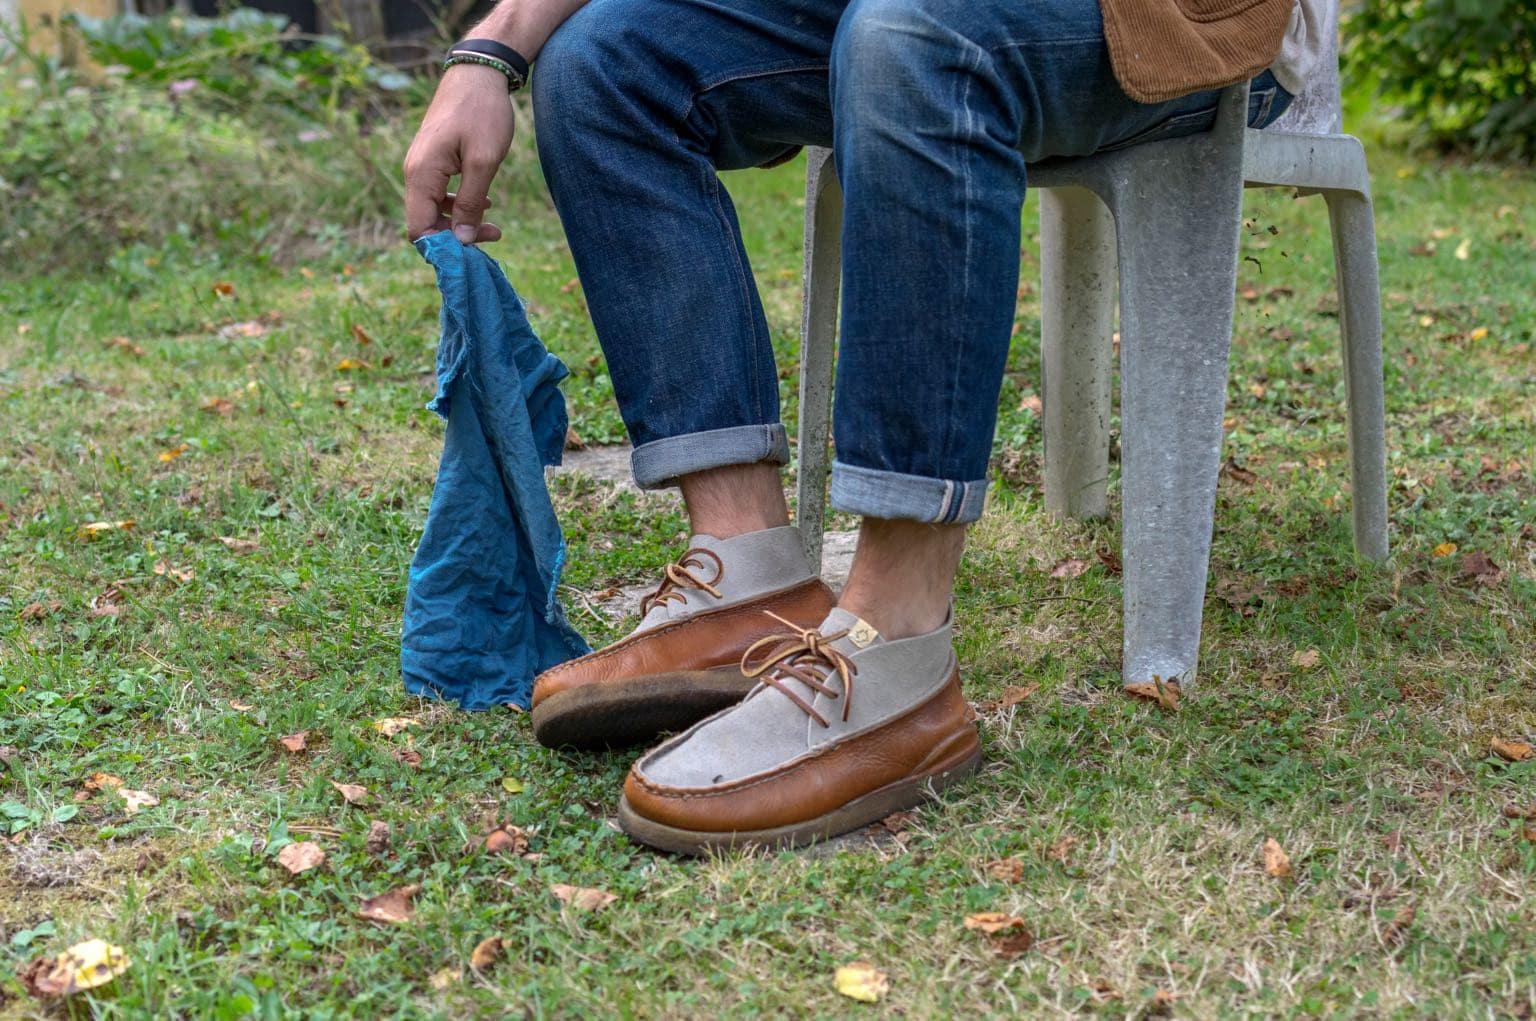 Visvim canoe moc mid-folk shoes - native shoes